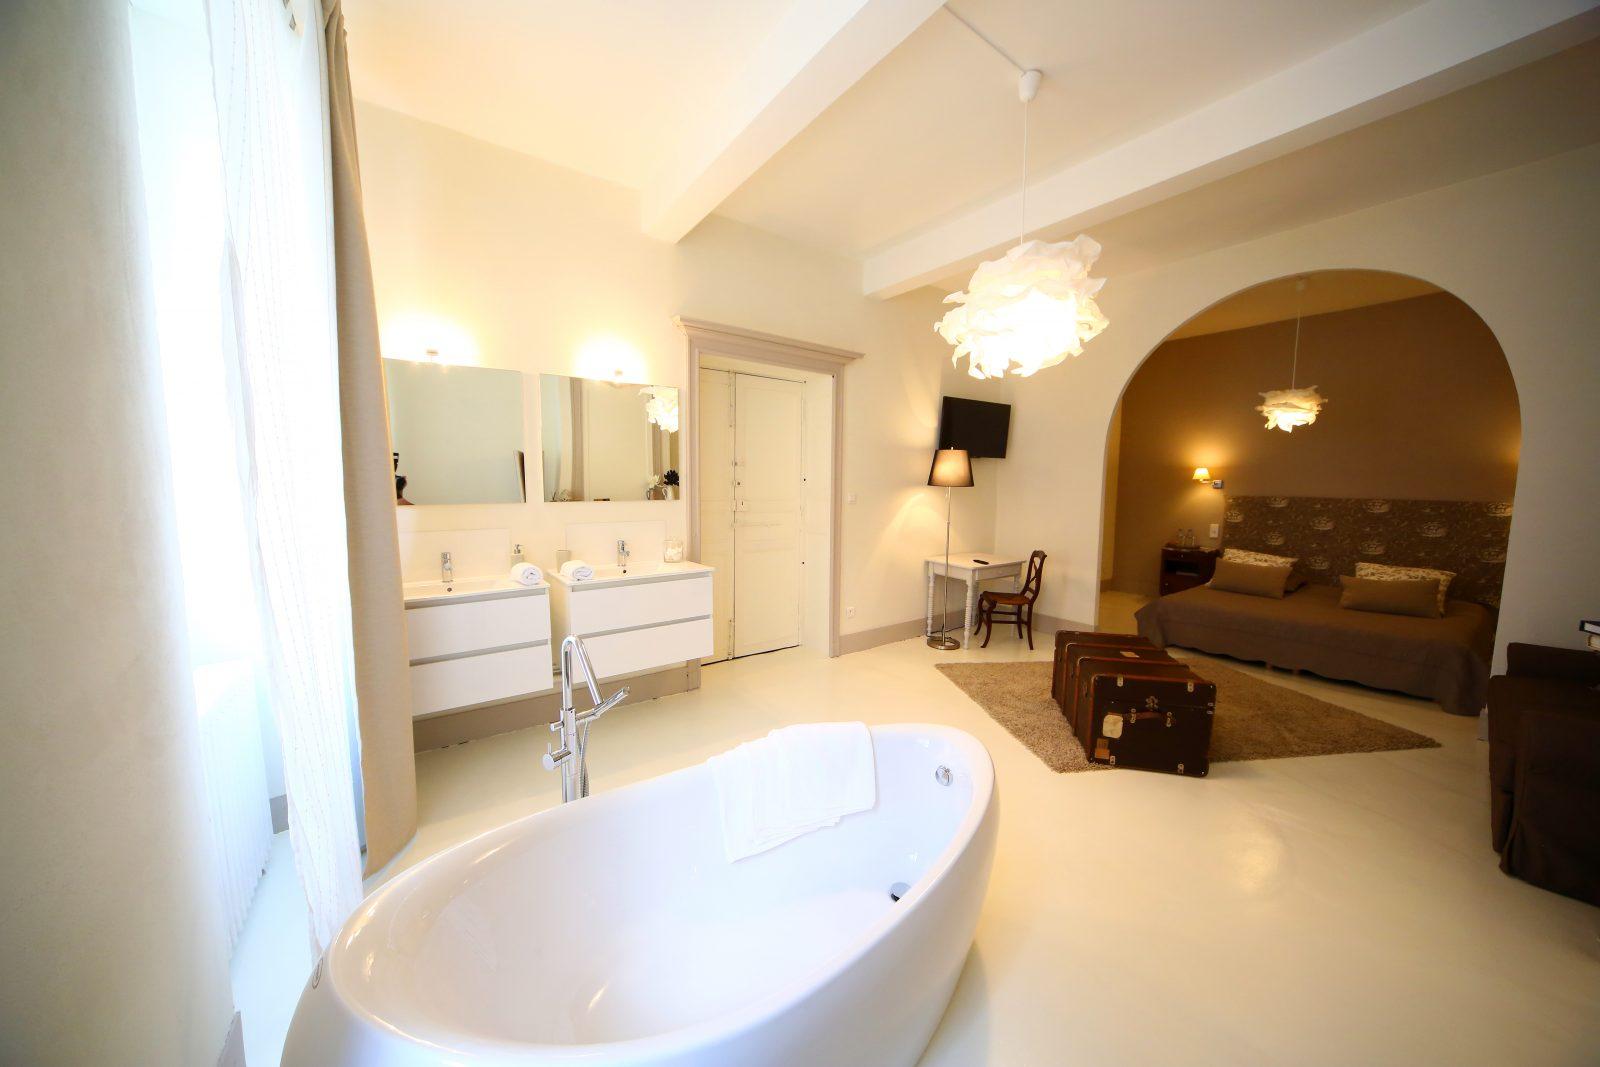 Hotel Particulier Delga – Suite